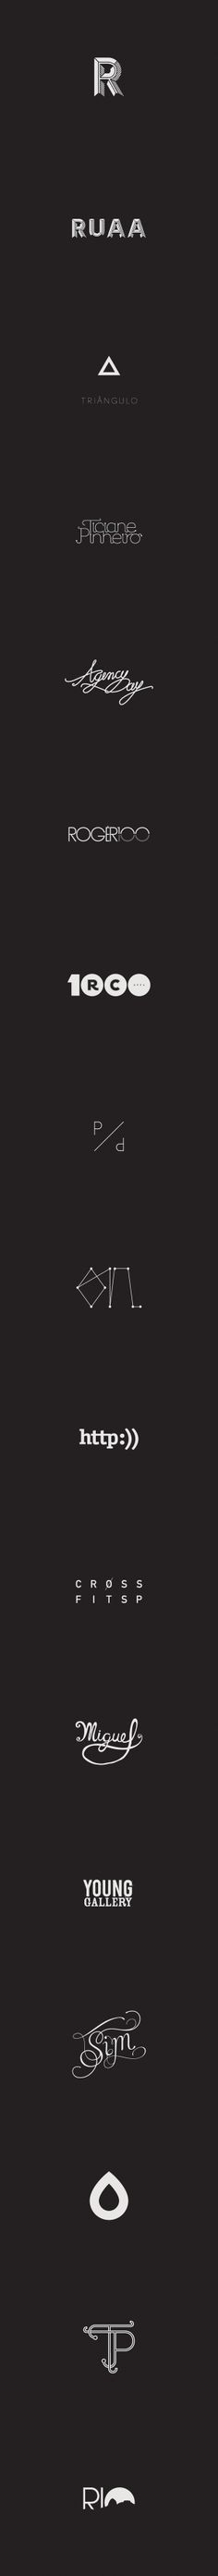 Logos by Pedro Paulino, via Behance